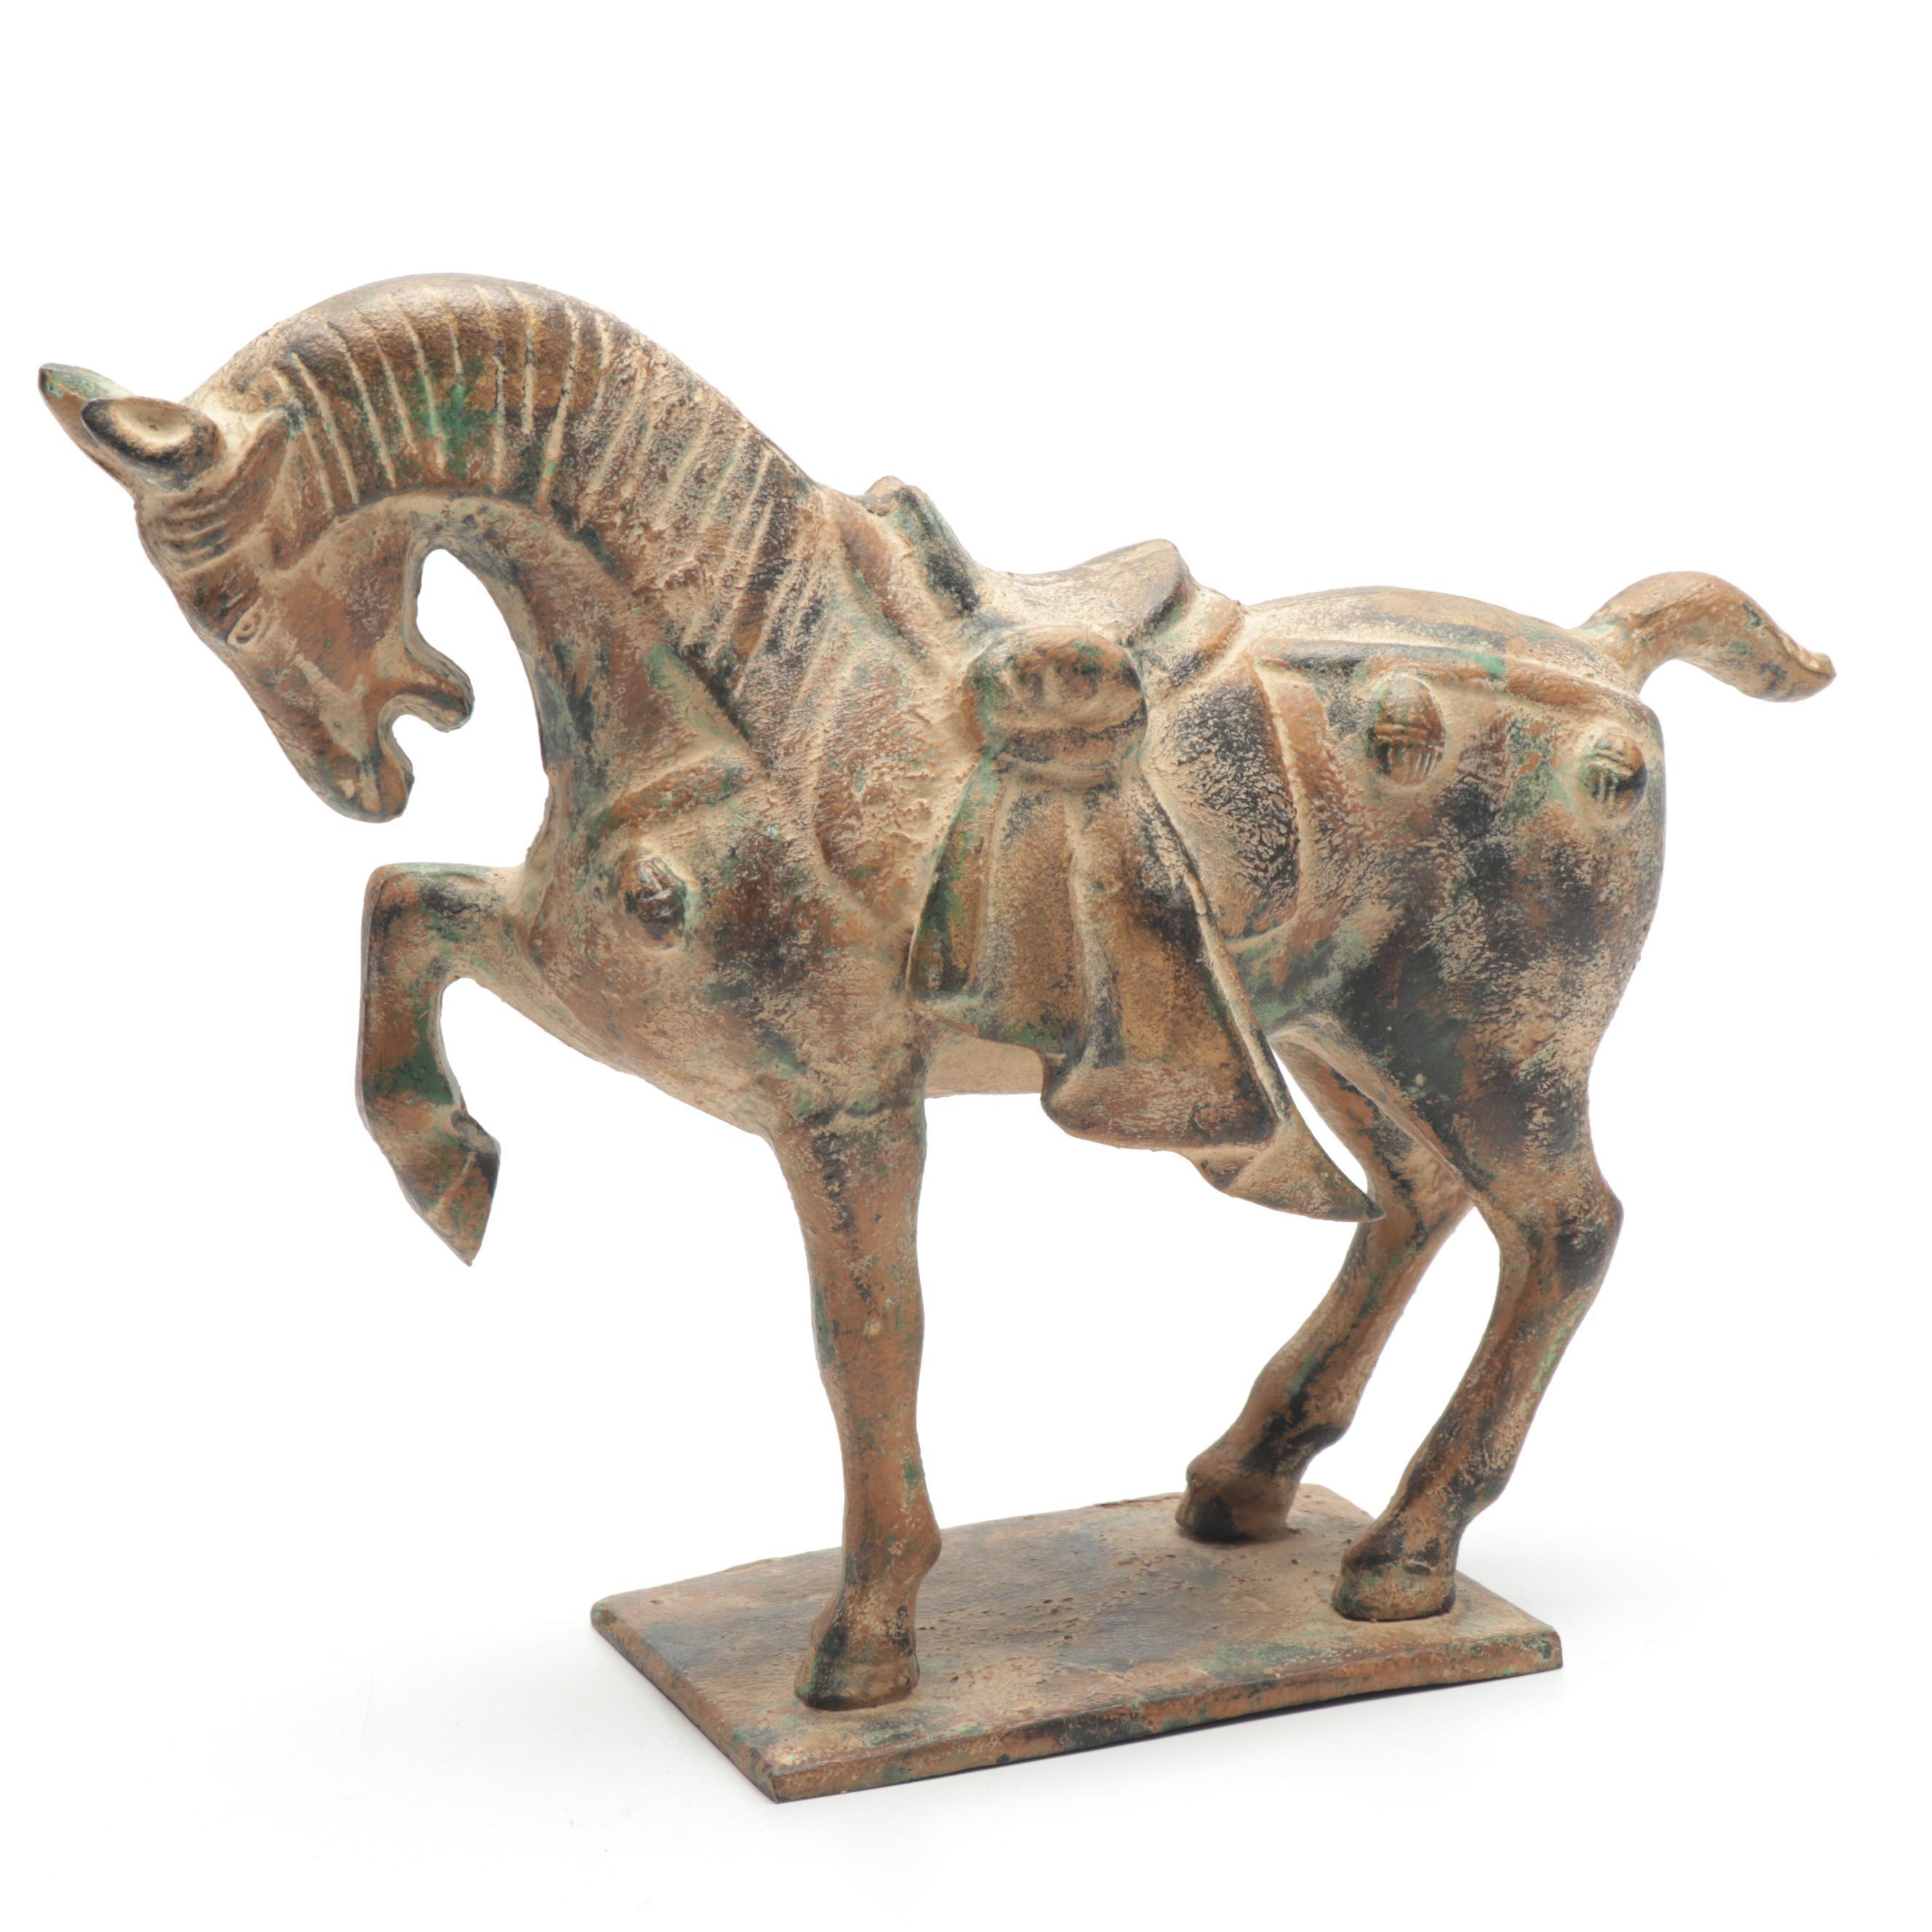 Decorative Asian Style Cast Iron Horse Figure